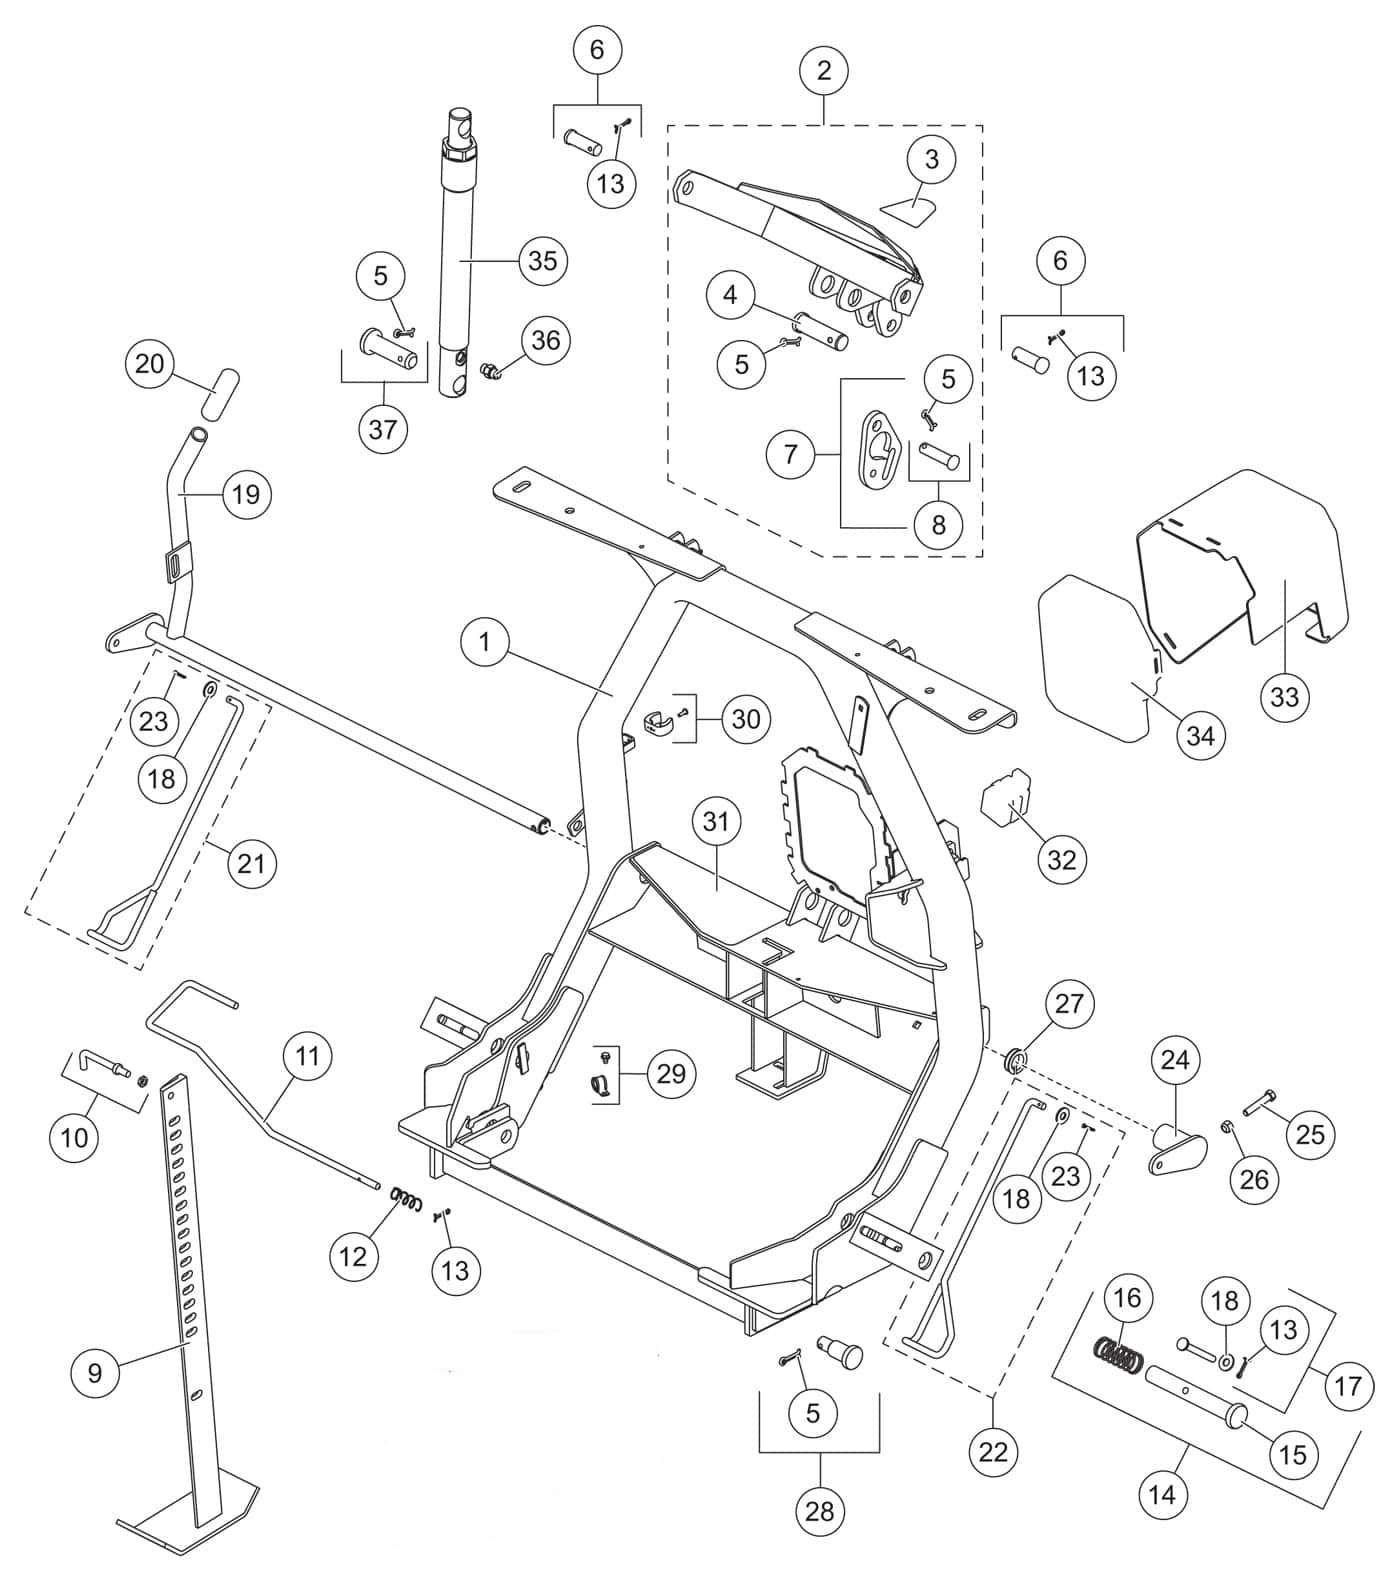 Fisher Hd2-hc - Hd2 Headgear Components